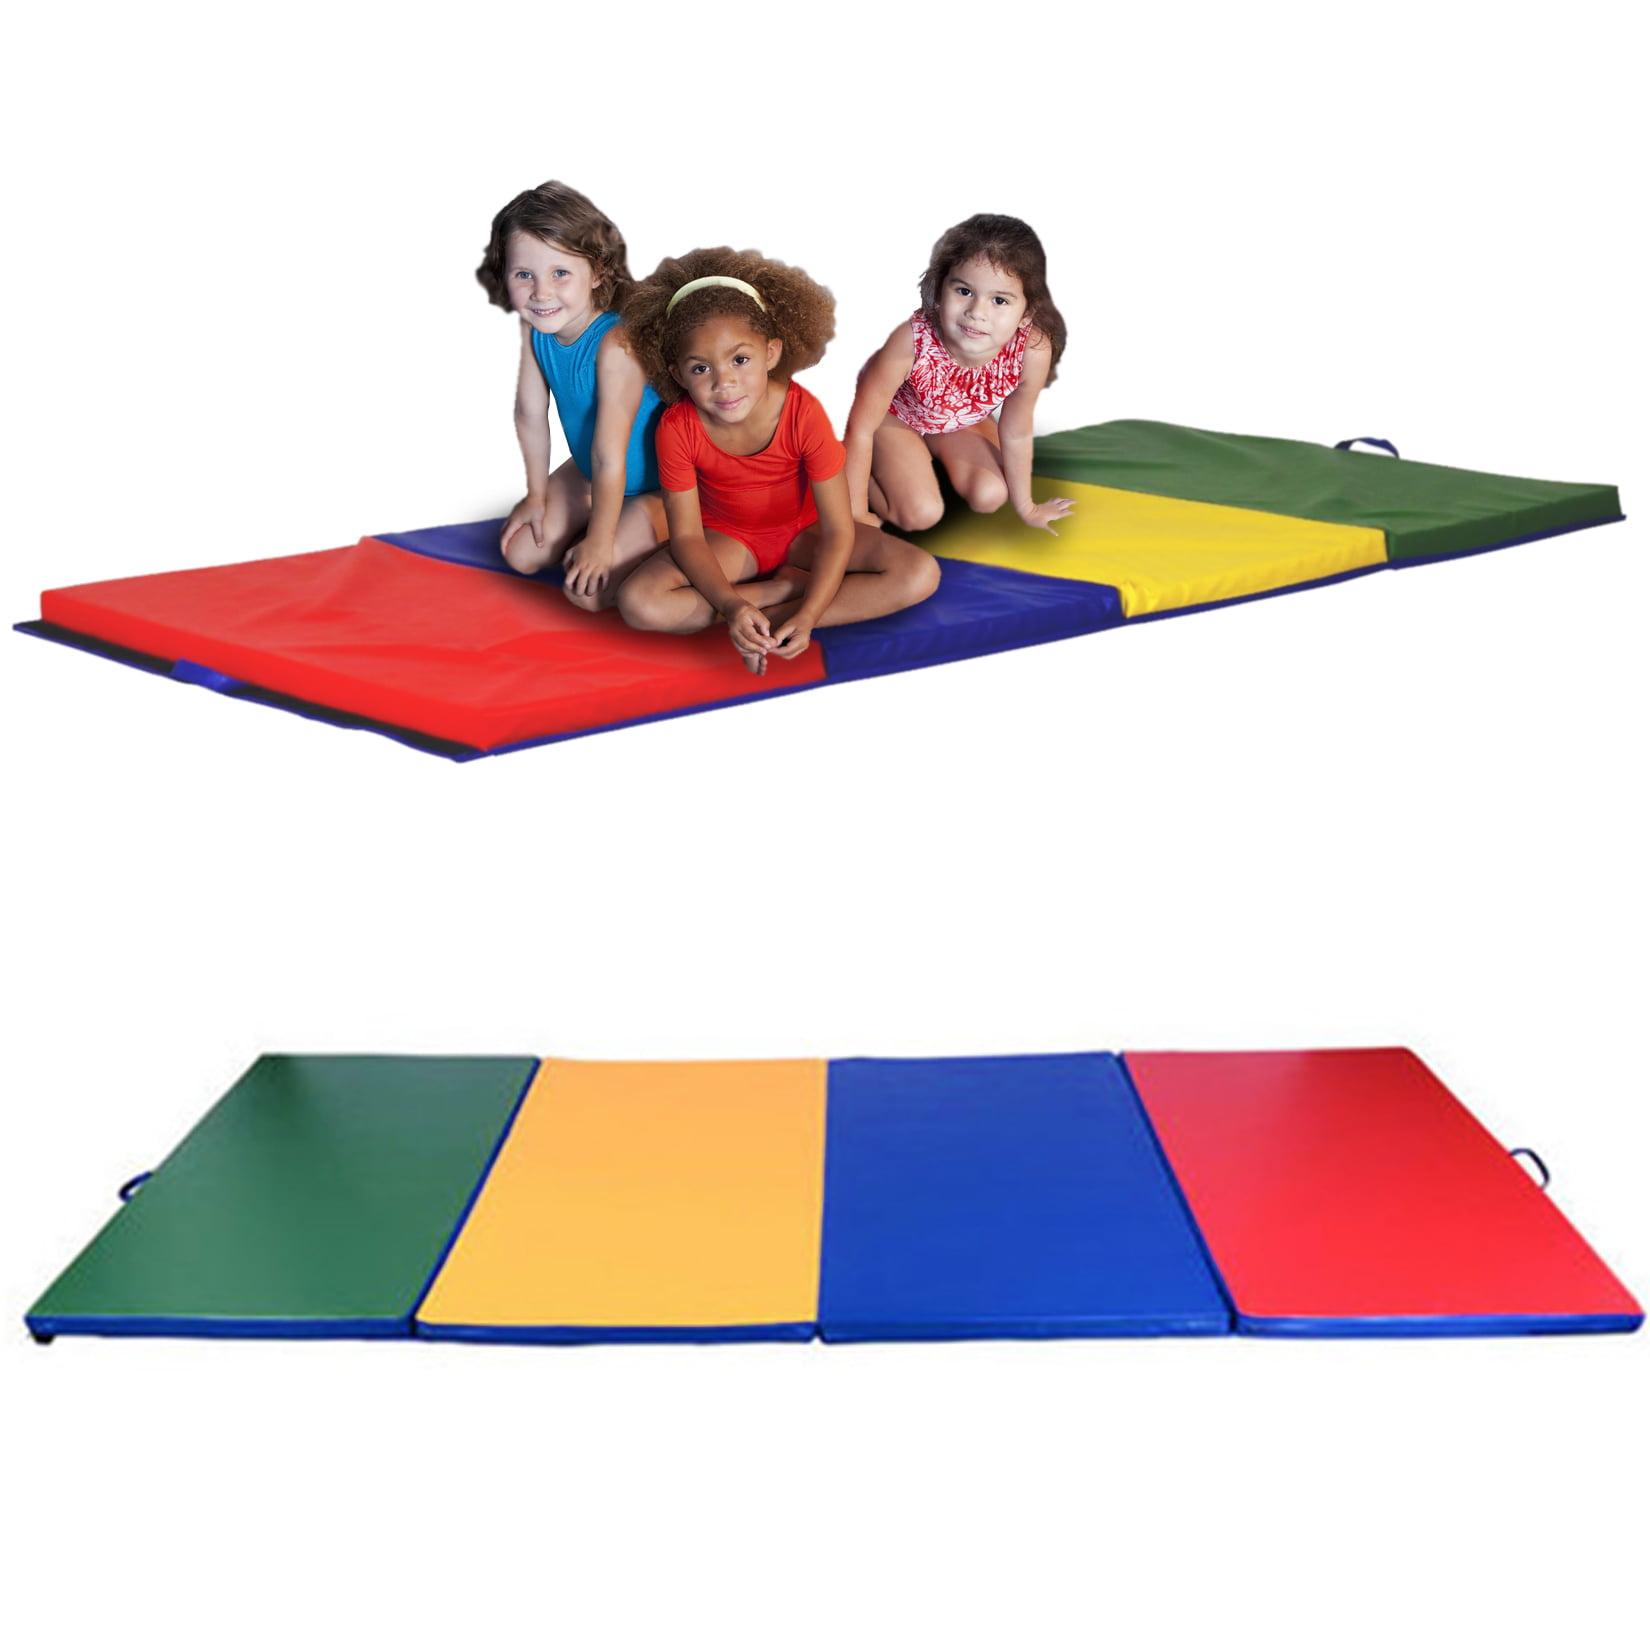 Rainbow 4 X6 X2 Quot Gymnastics Gym Folding Exercise Aerobics